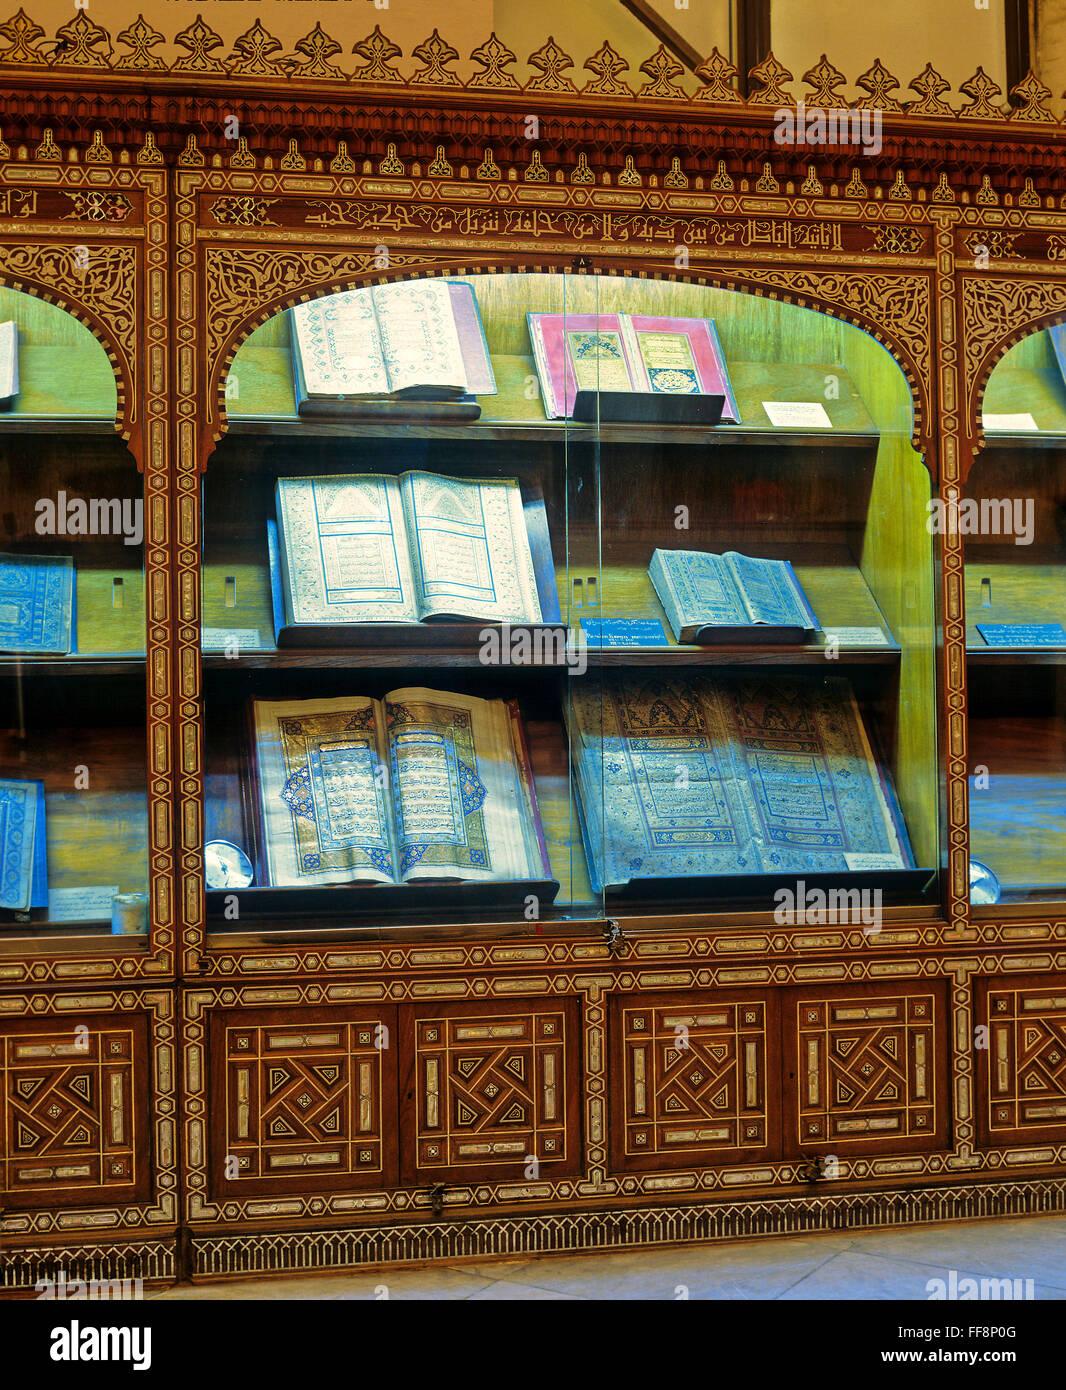 Showcase with old books of the Koran, Islamic art museum, Cairo, Egypt, Africa - Stock Image